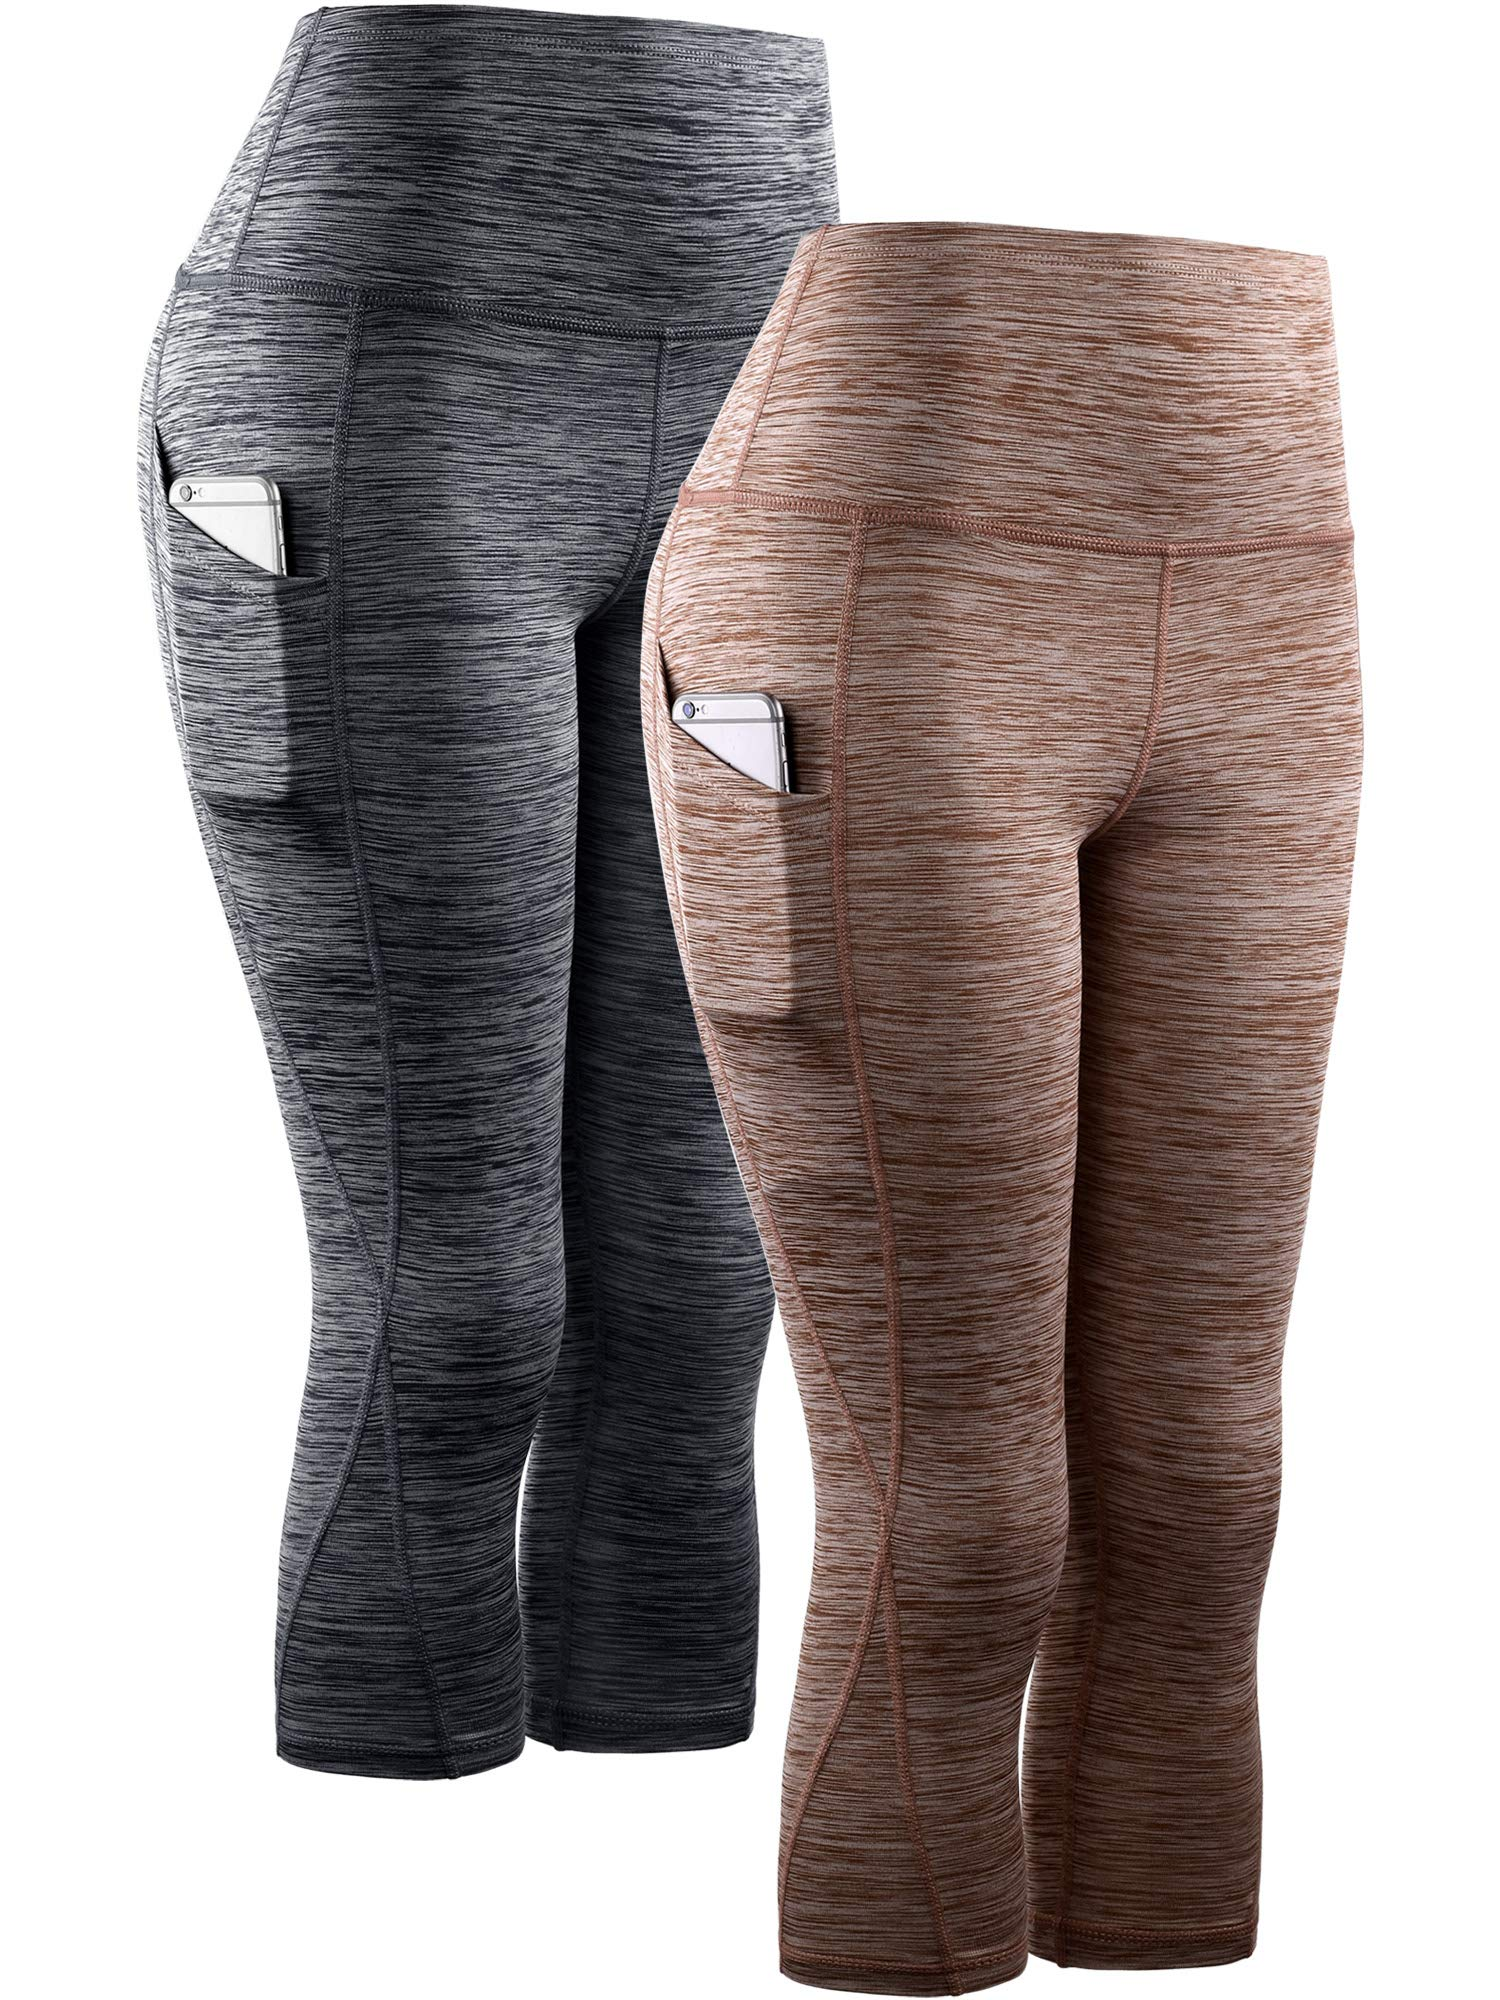 Neleus Women's 2 Pack Tummy Control High Waist Yoga Capri Leggings with Pockets,9034,Black,Brown,M,EU L by Neleus